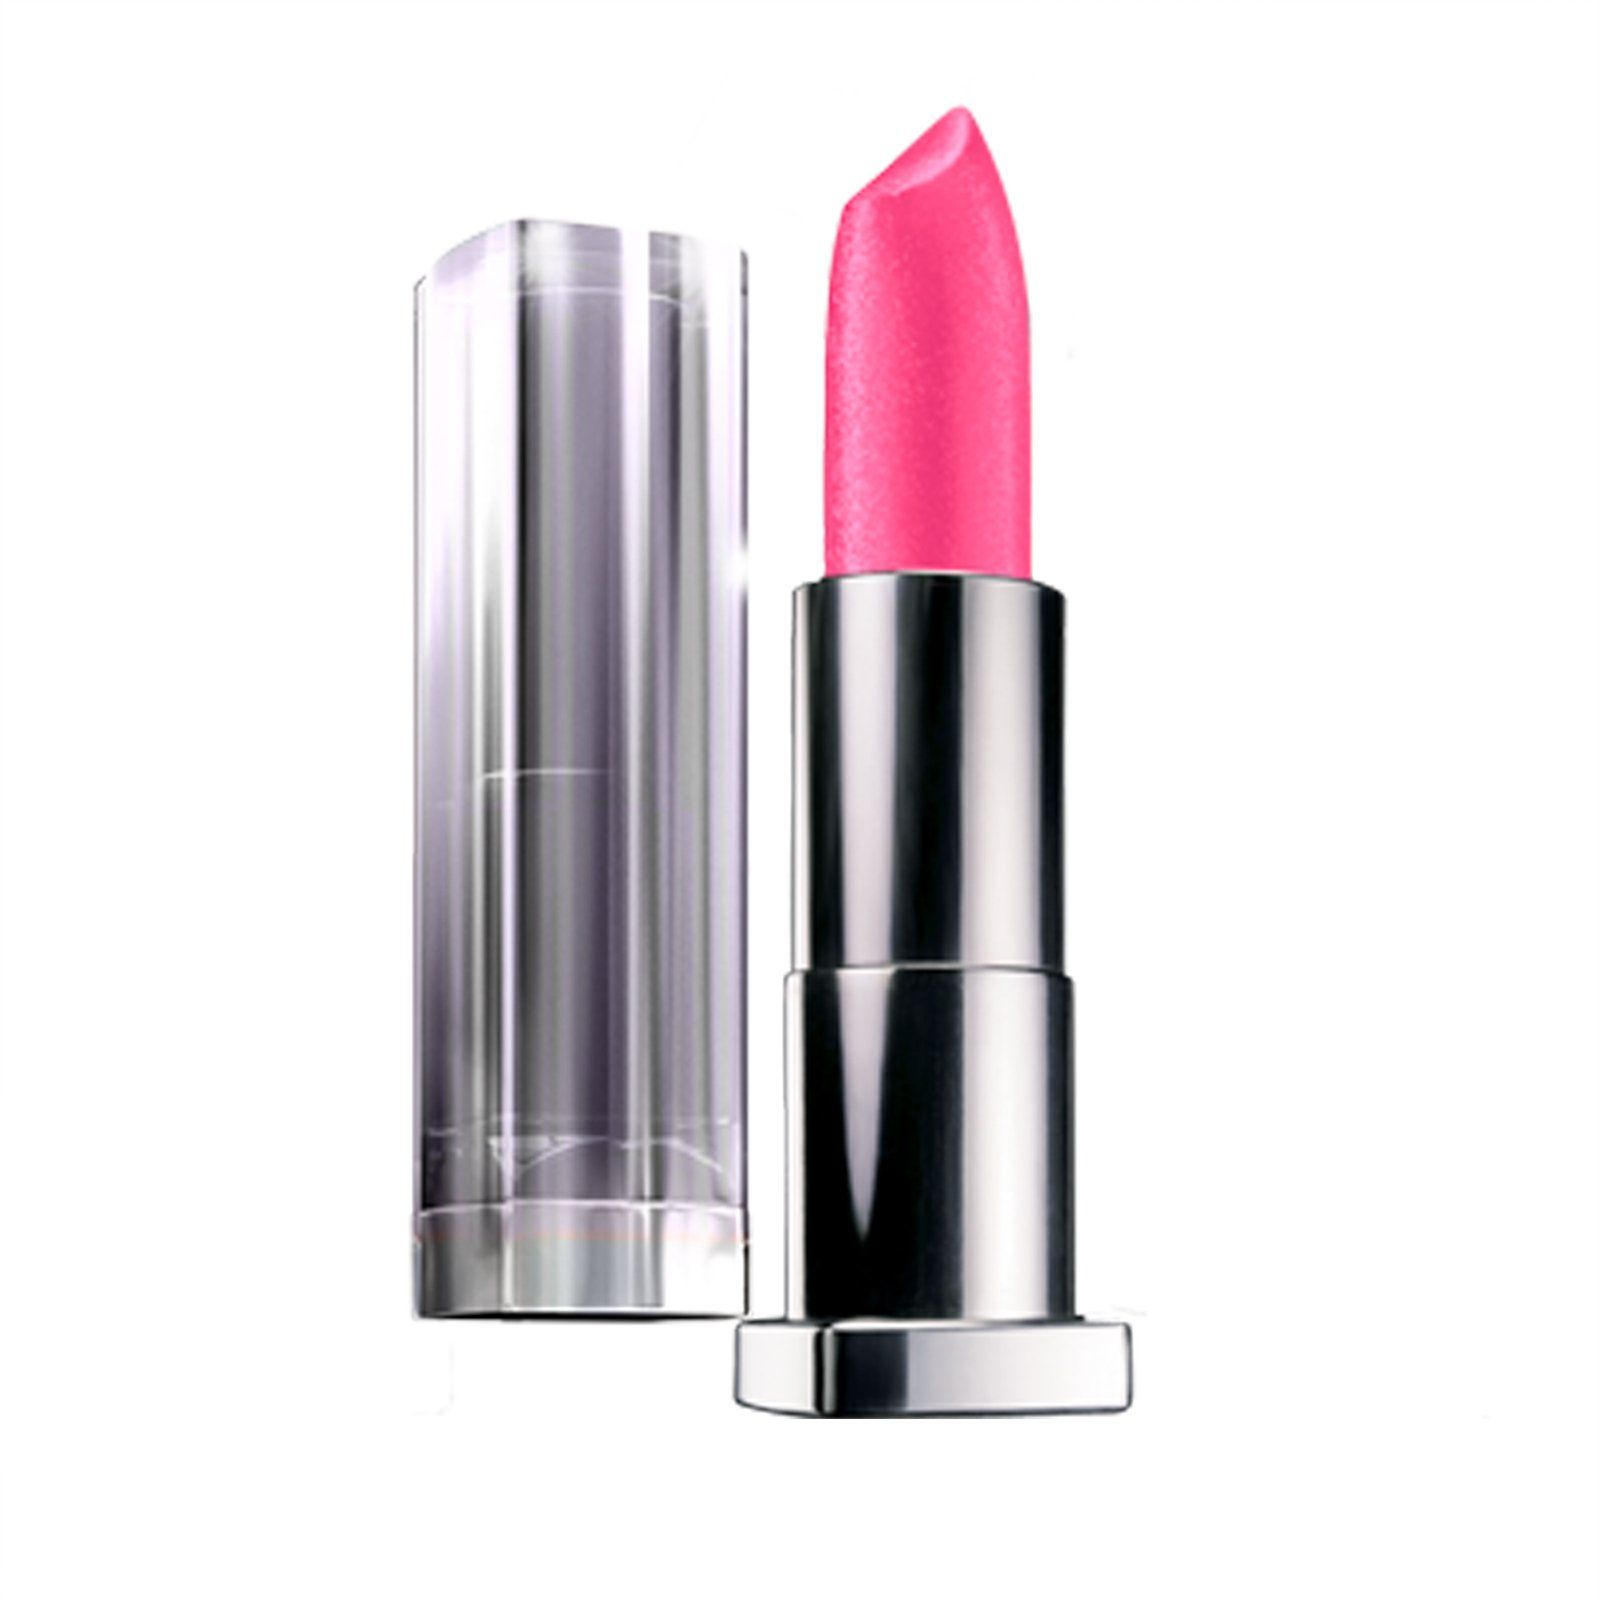 13 Sensational Schemes That Are: Maybelline New York Color Sensational High Shine Lipcolor